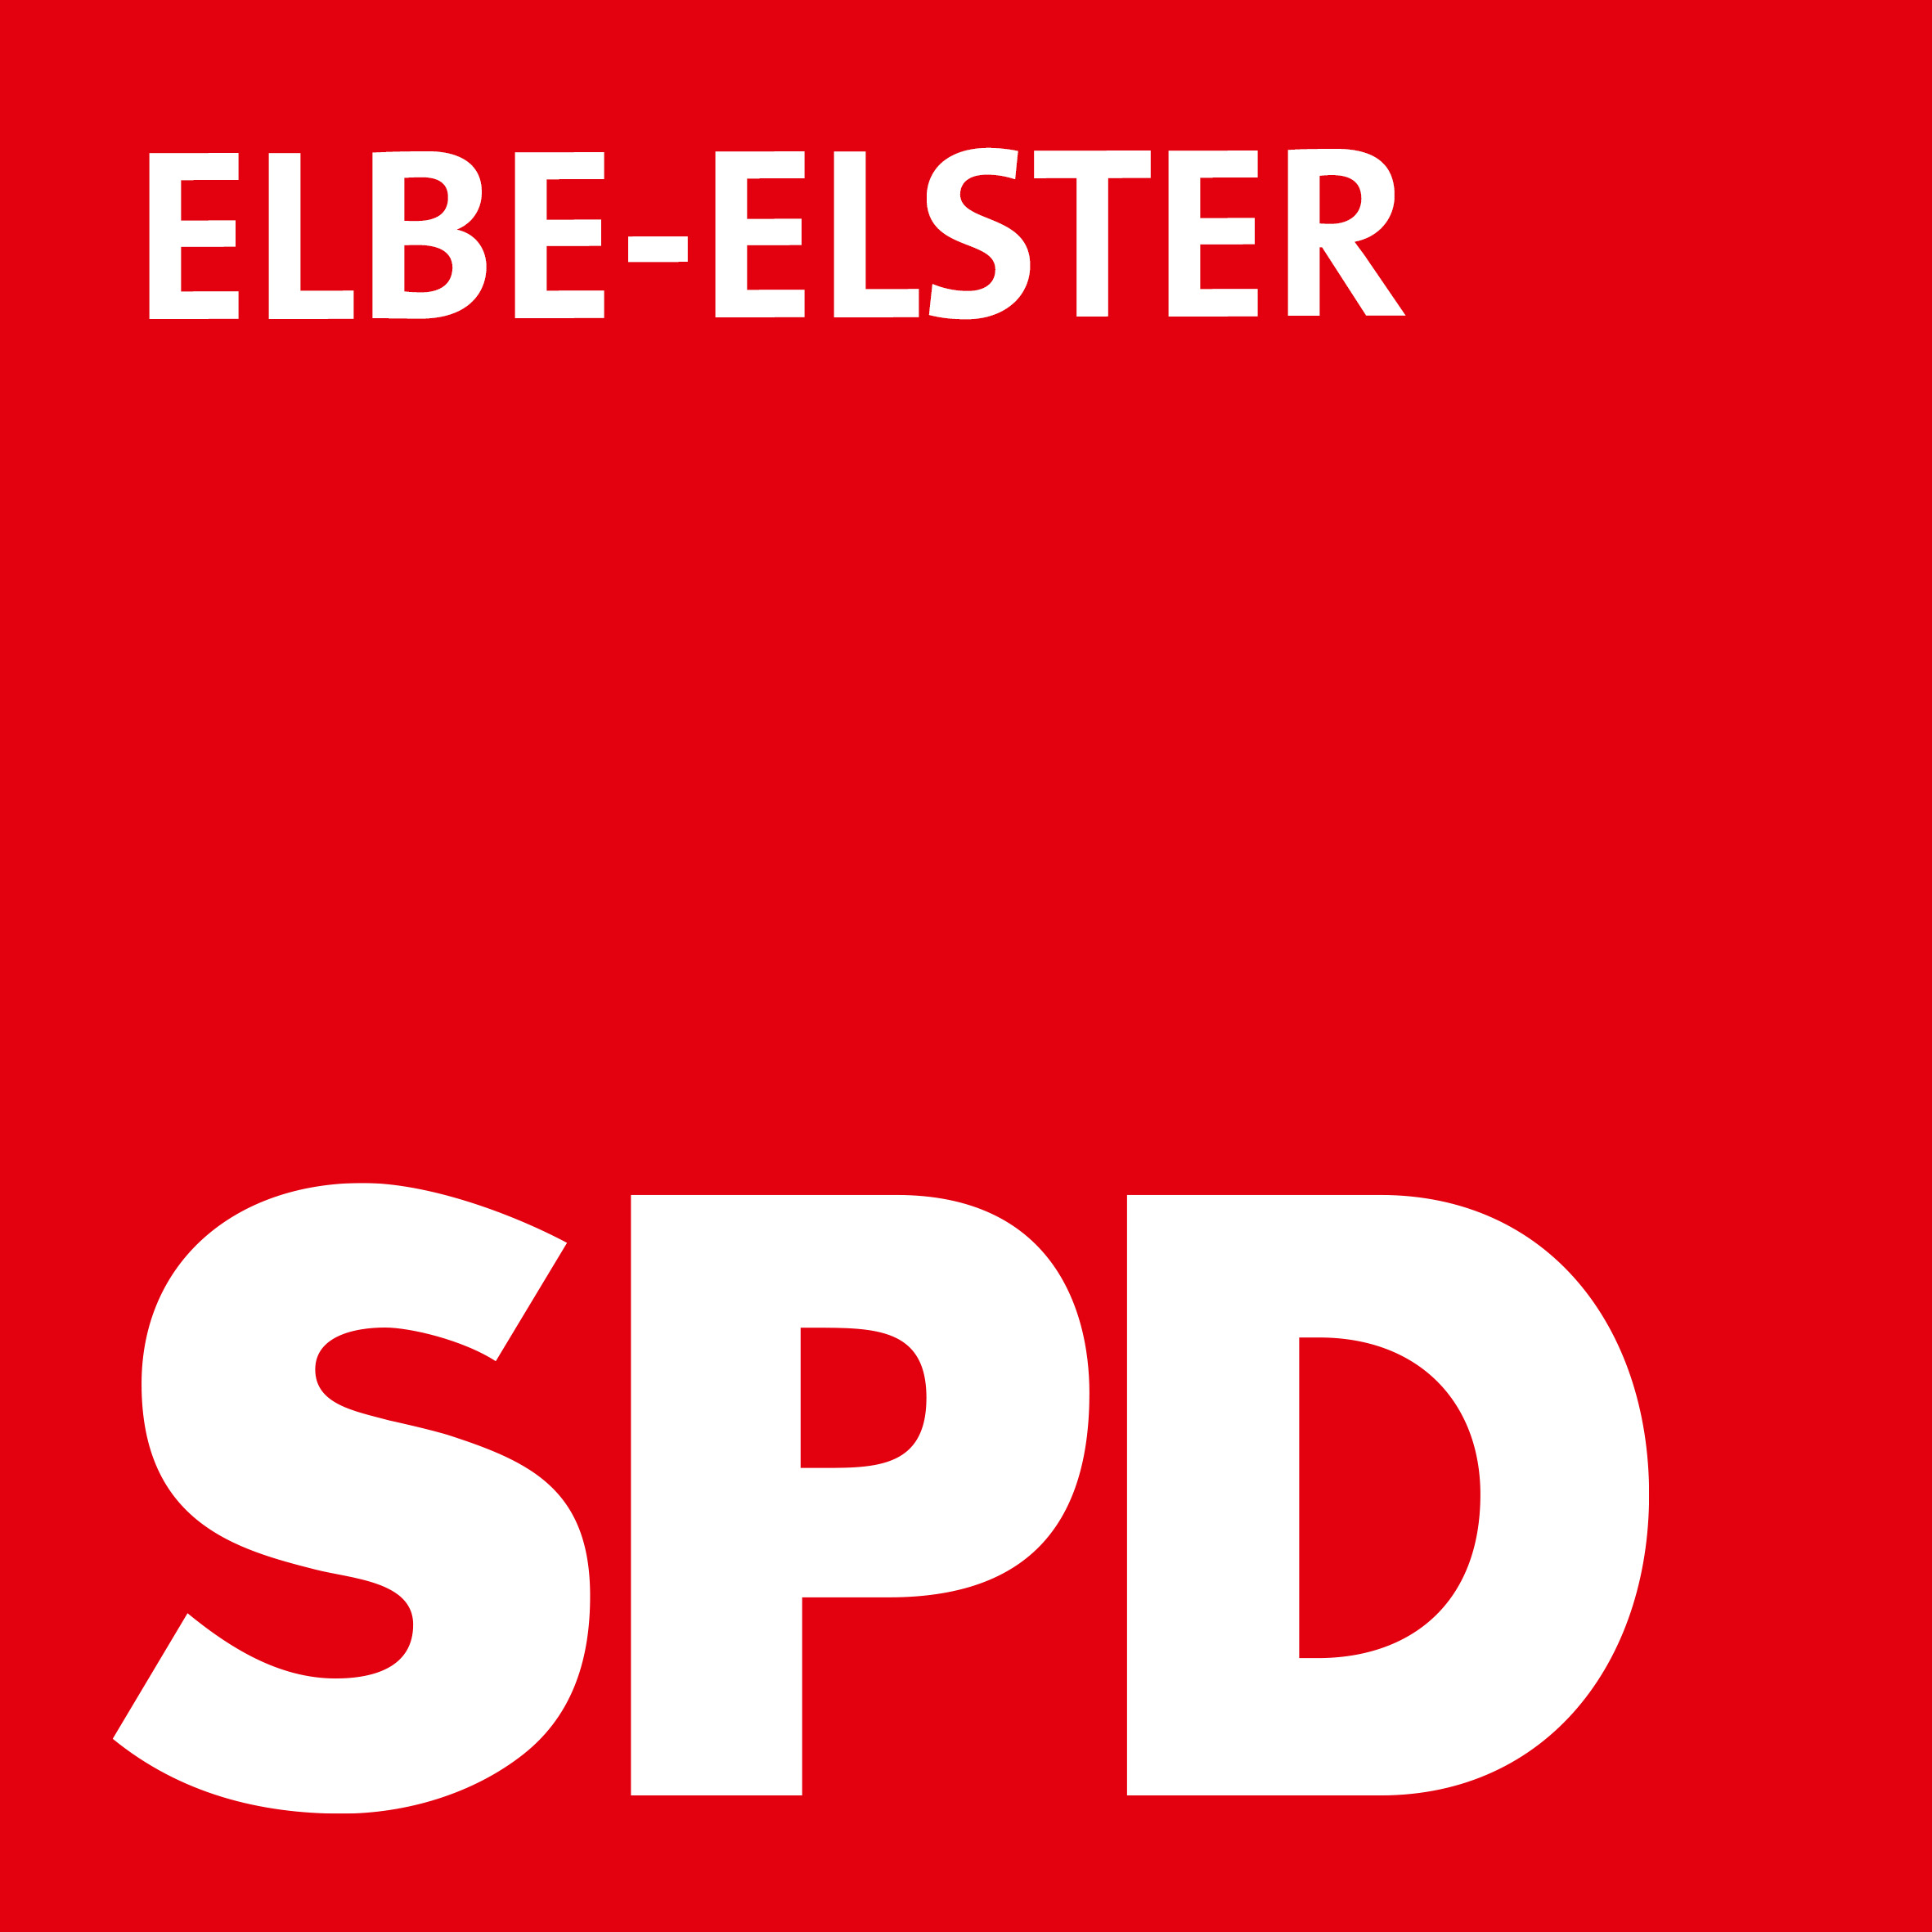 SPD Elbe-Elster